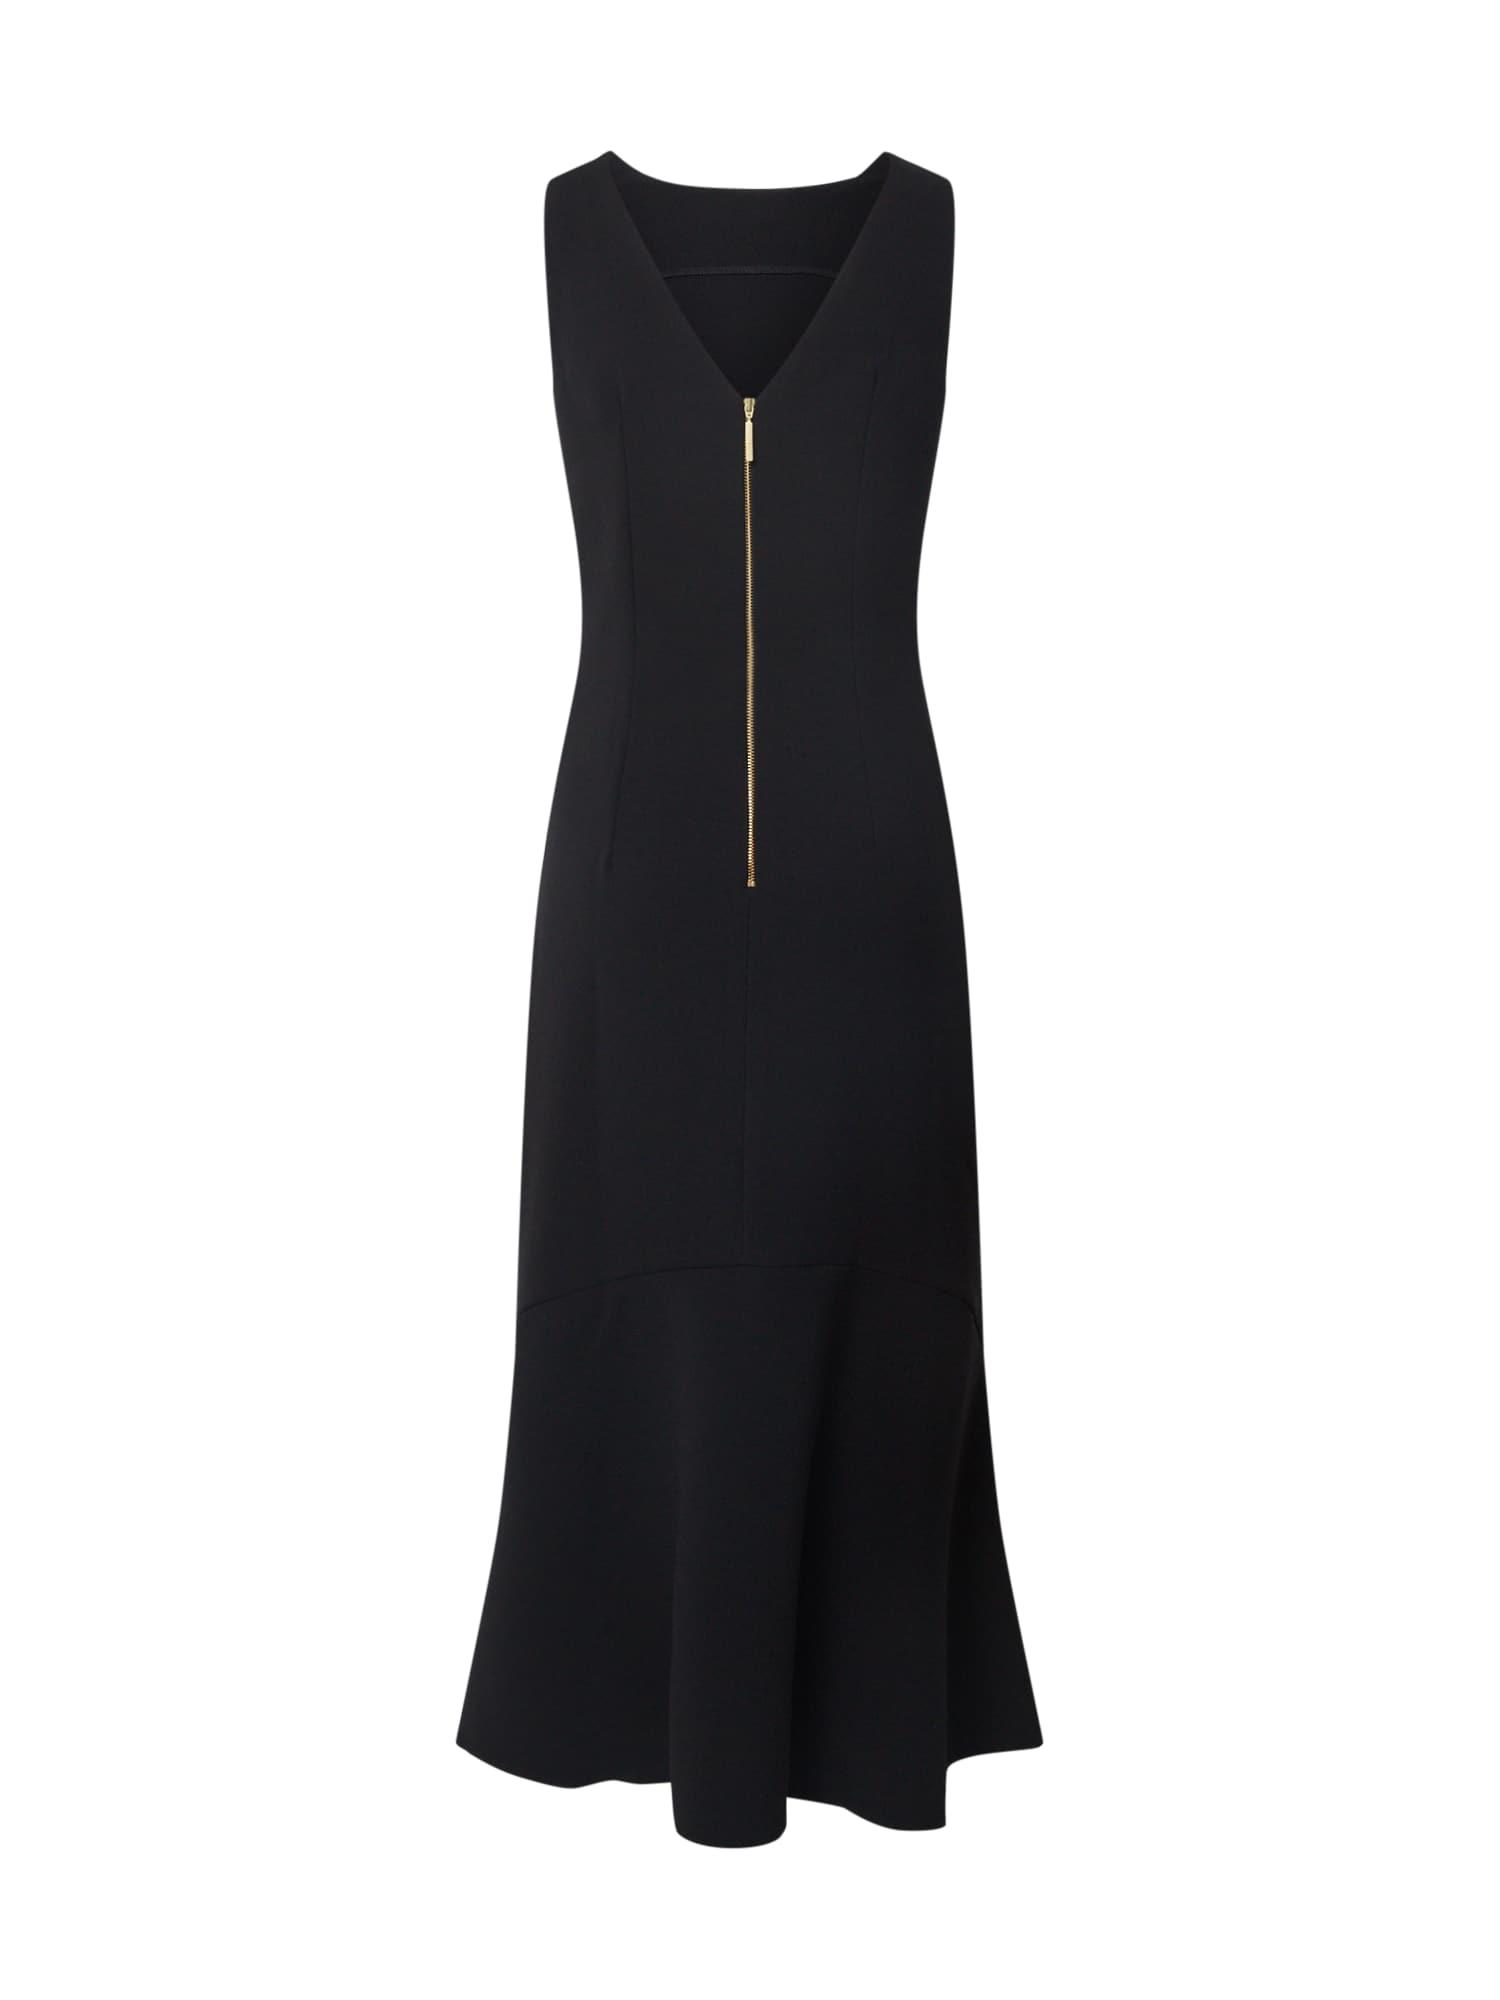 closet london - Abendkleid